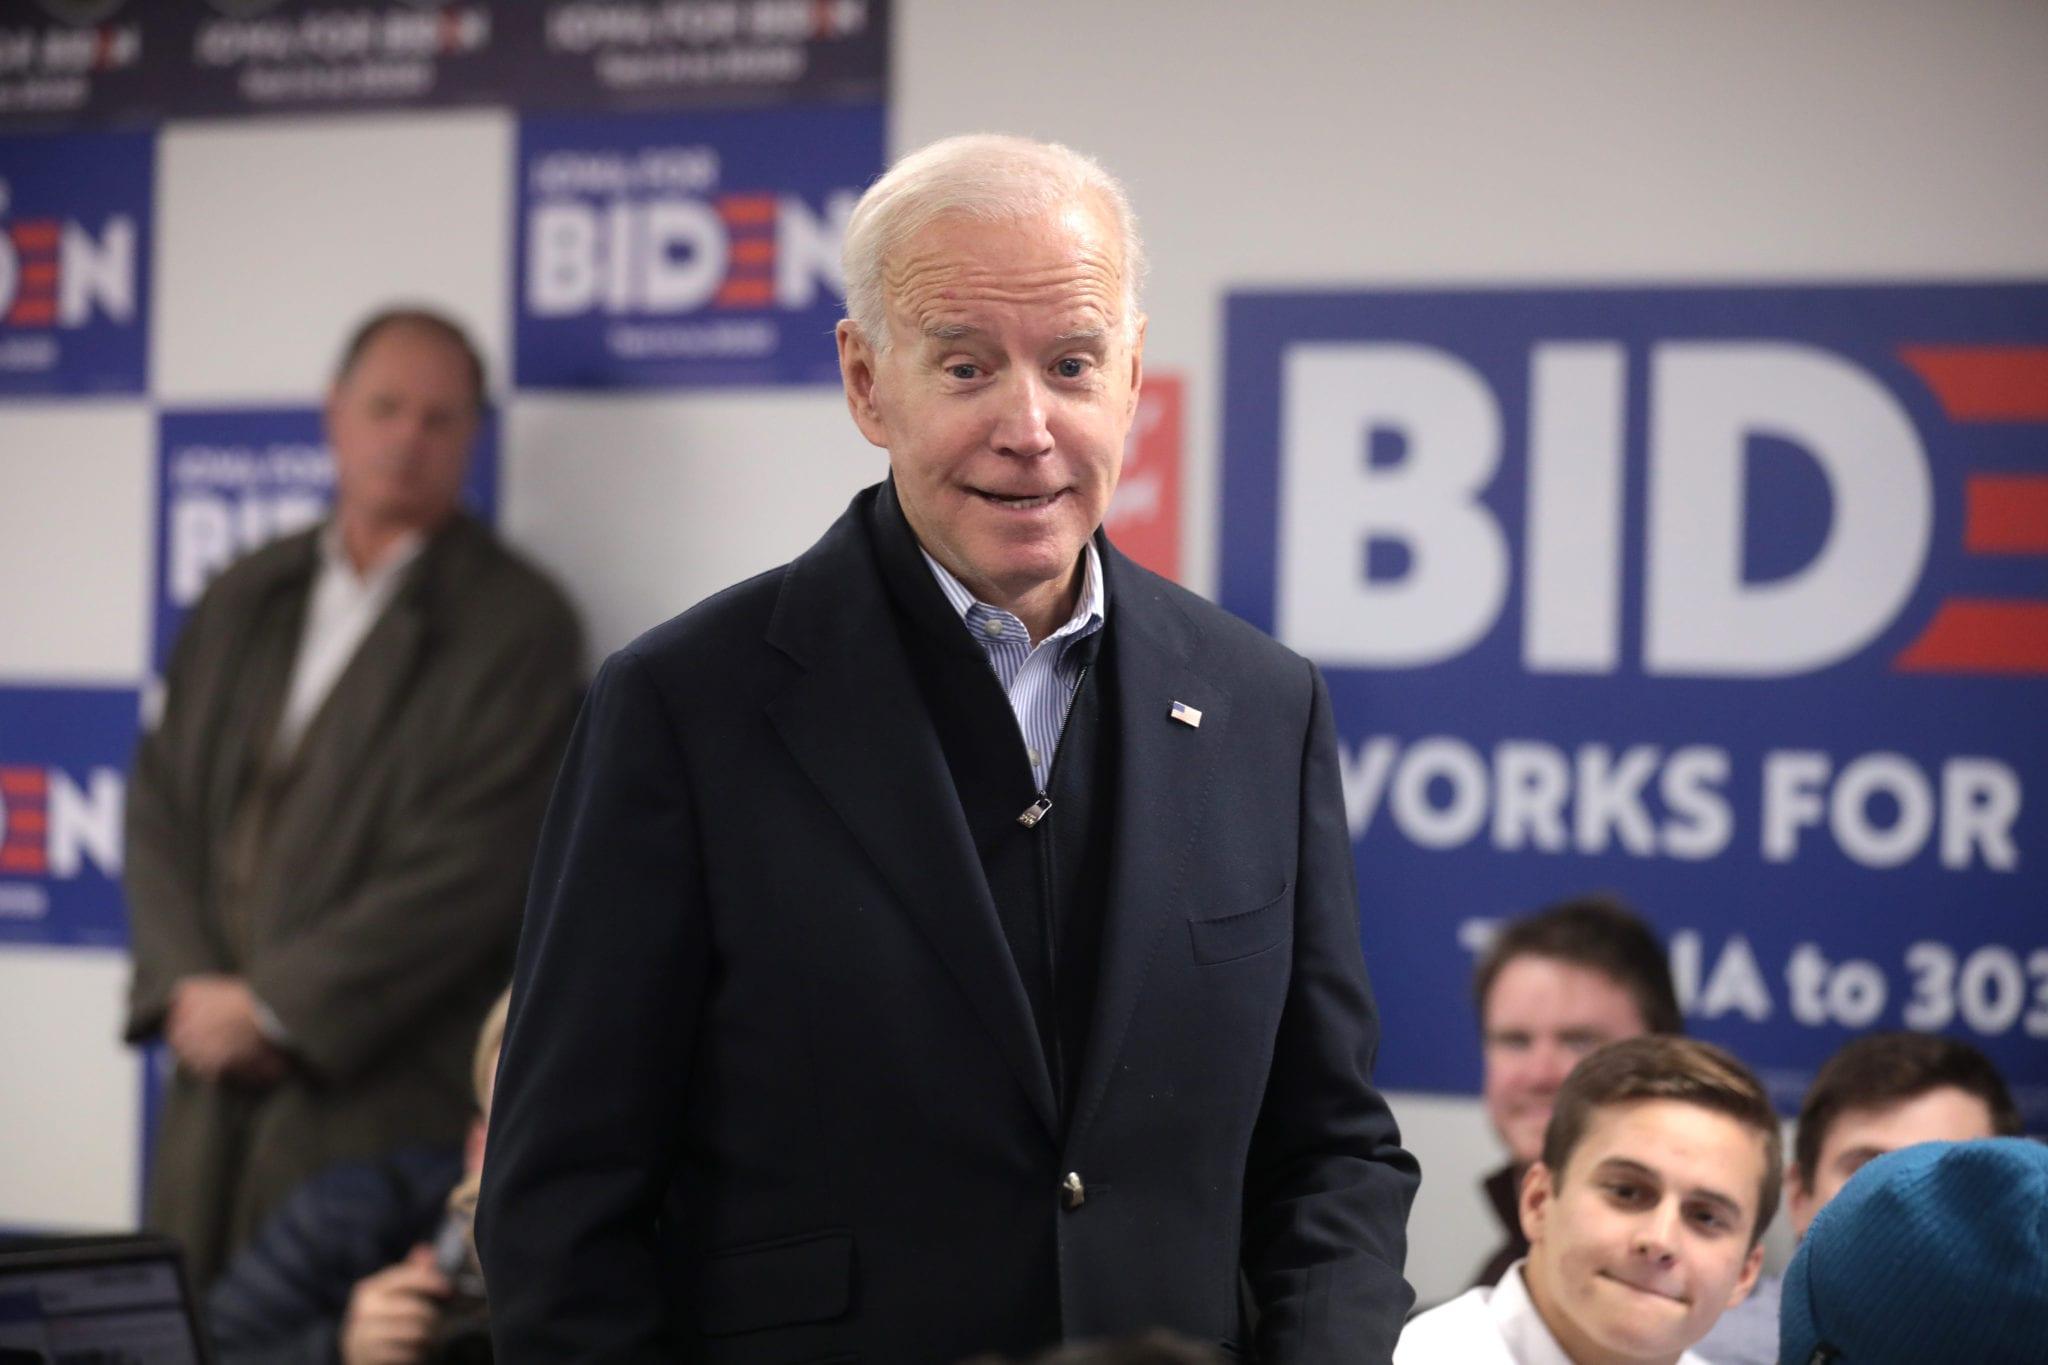 Biden's new cannabis plan draws ire of advocates